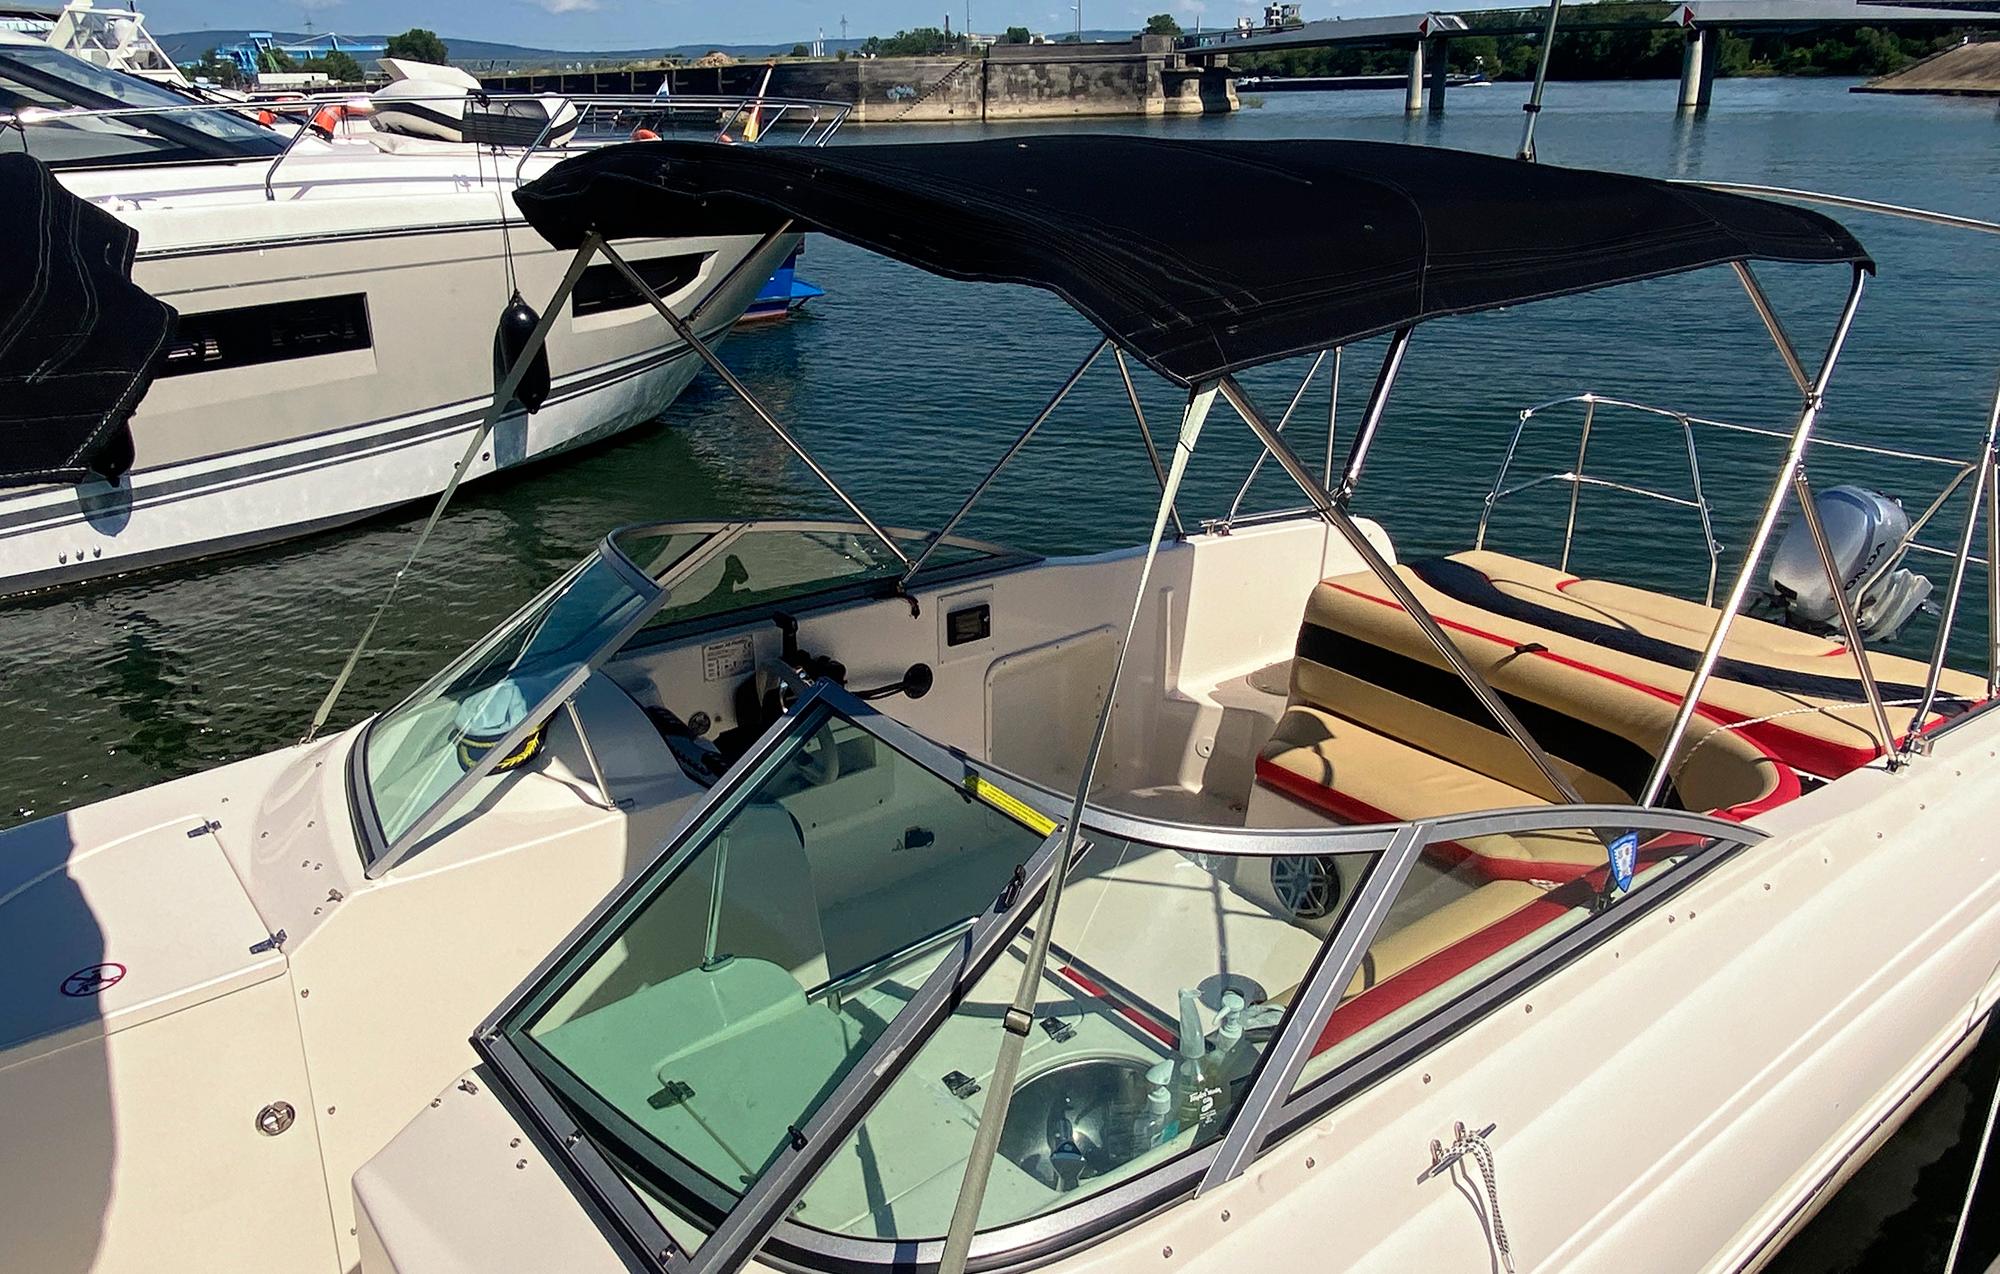 motorboot-fahren-frankfurt-am-main-bg3